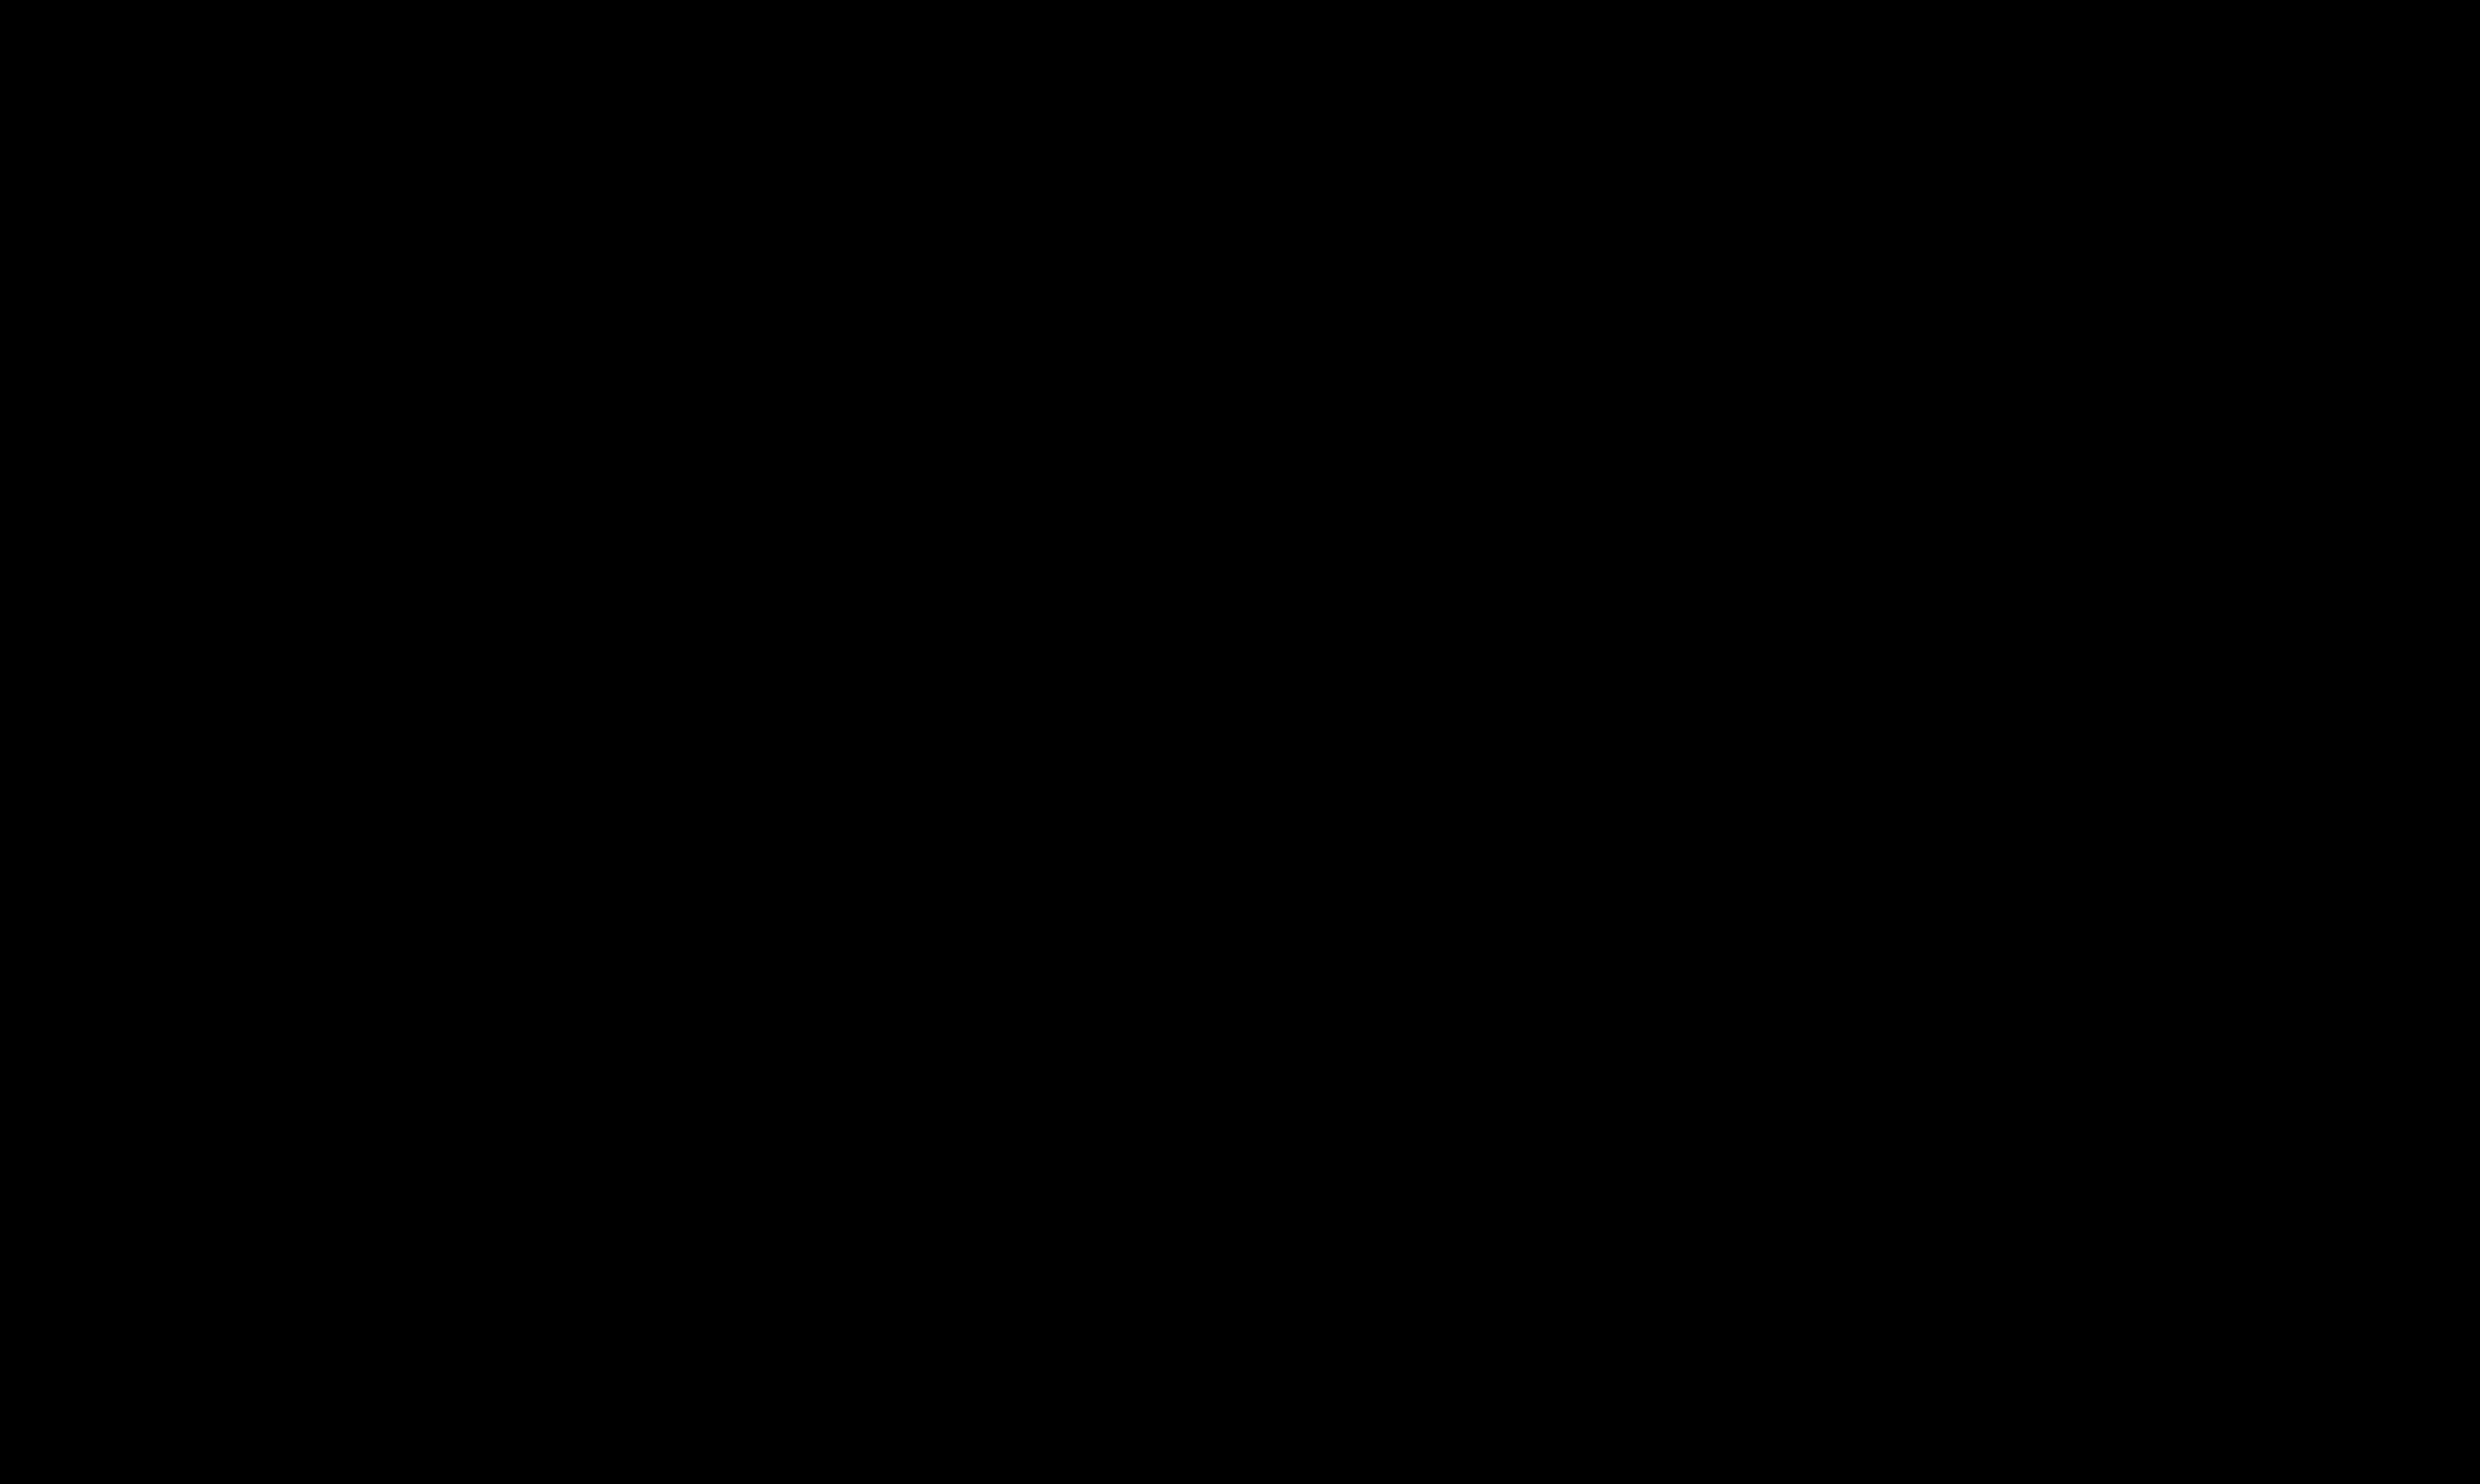 wetgeving-2